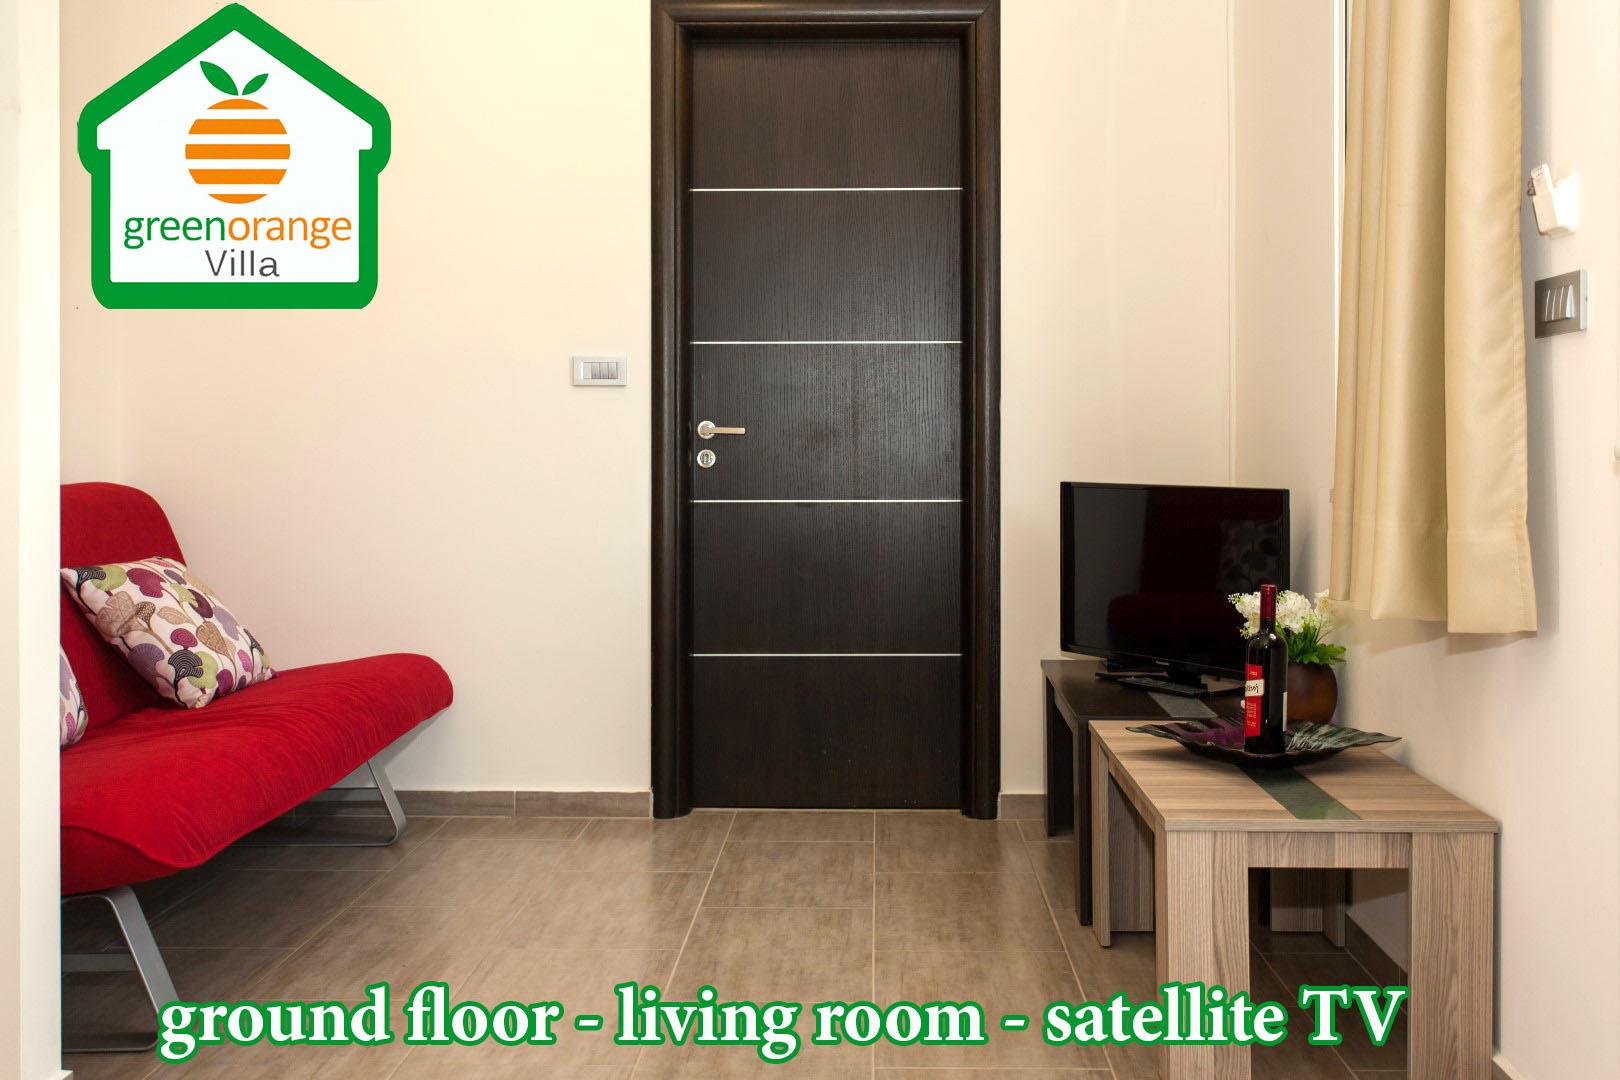 living-room-satellite-tv-green-orange-villa